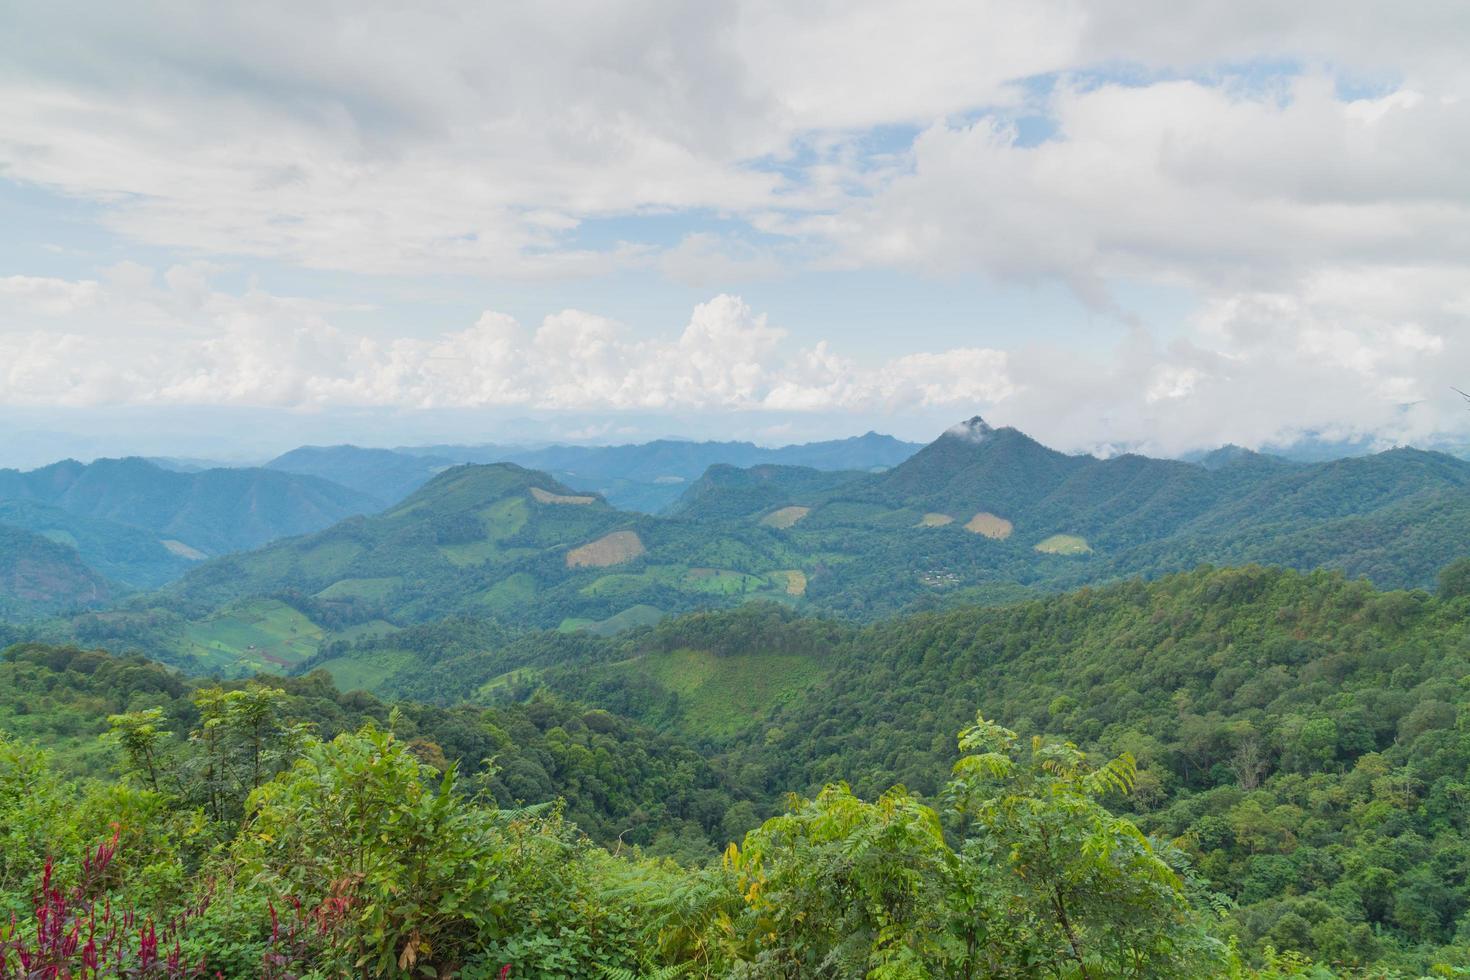 paesaggio forestale in thailandia foto